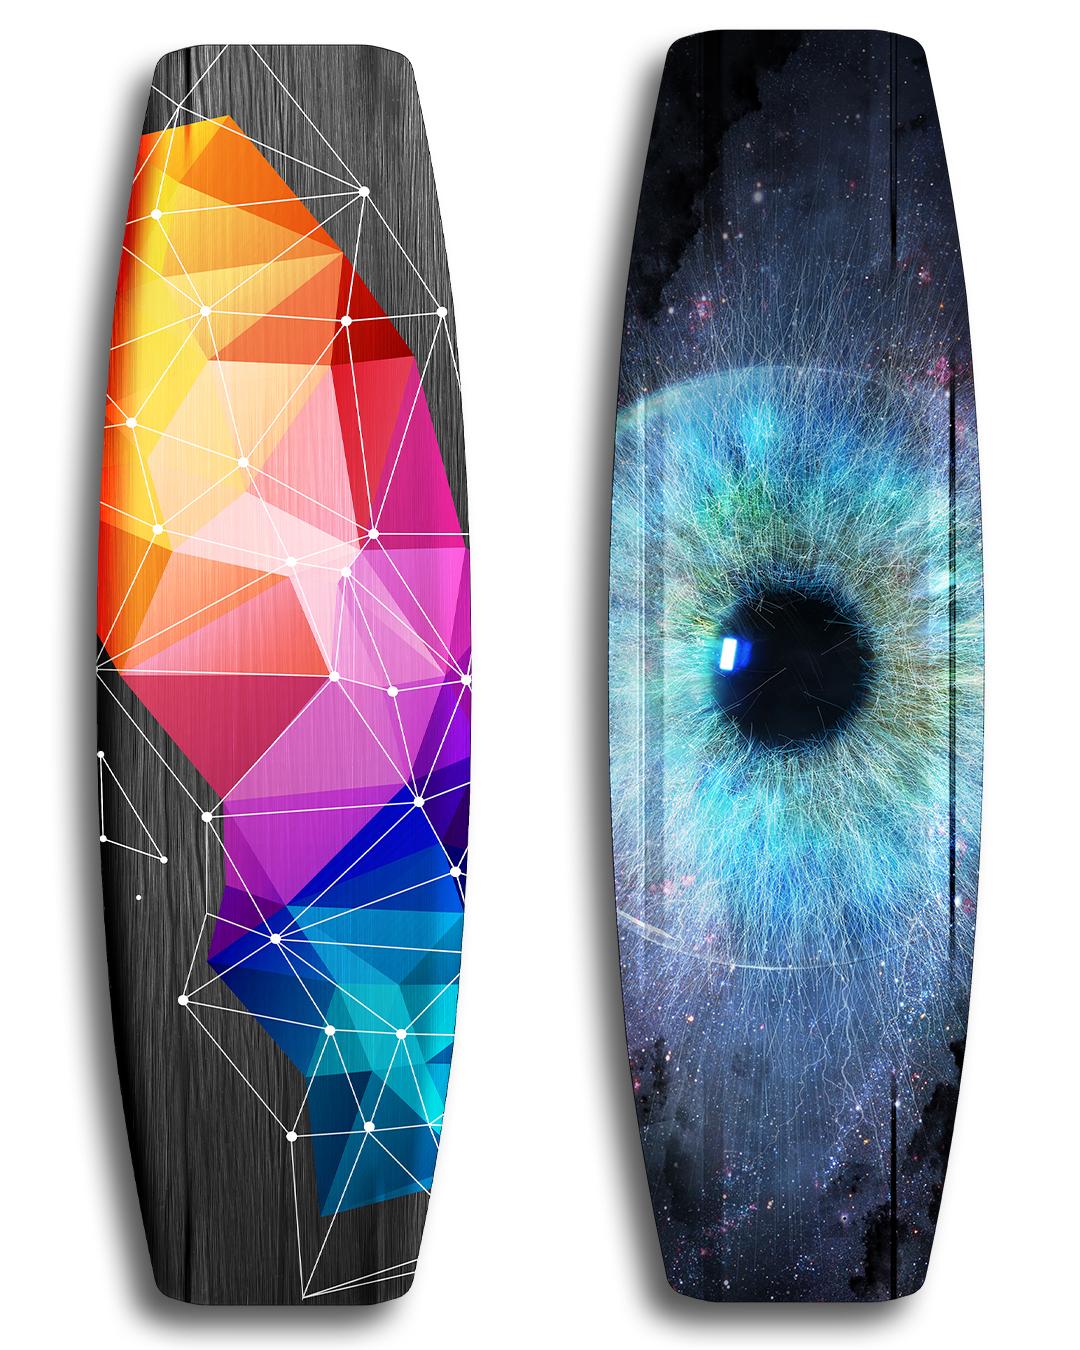 Slider wakeboard - Vivid custom graphics - Wood core - Triaxial fiberglass construction 00034